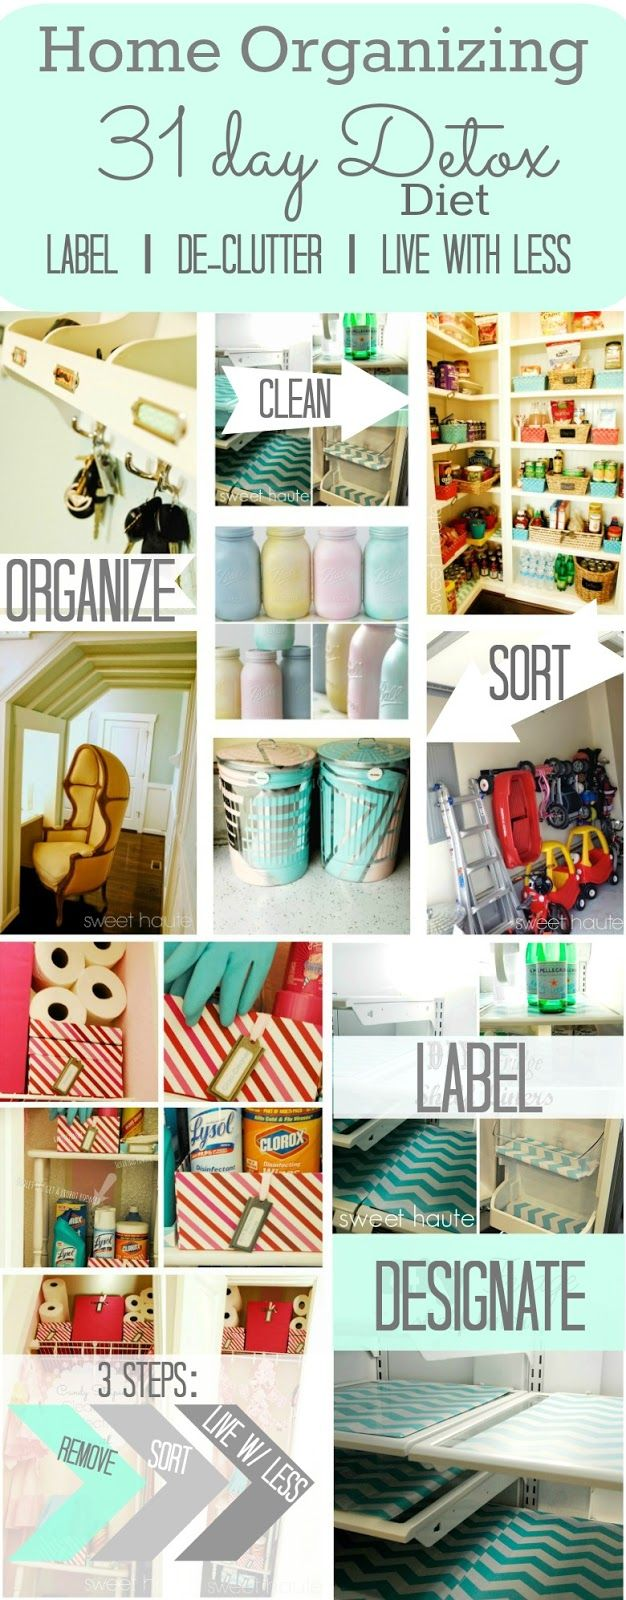 best organization images on pinterest organization ideas